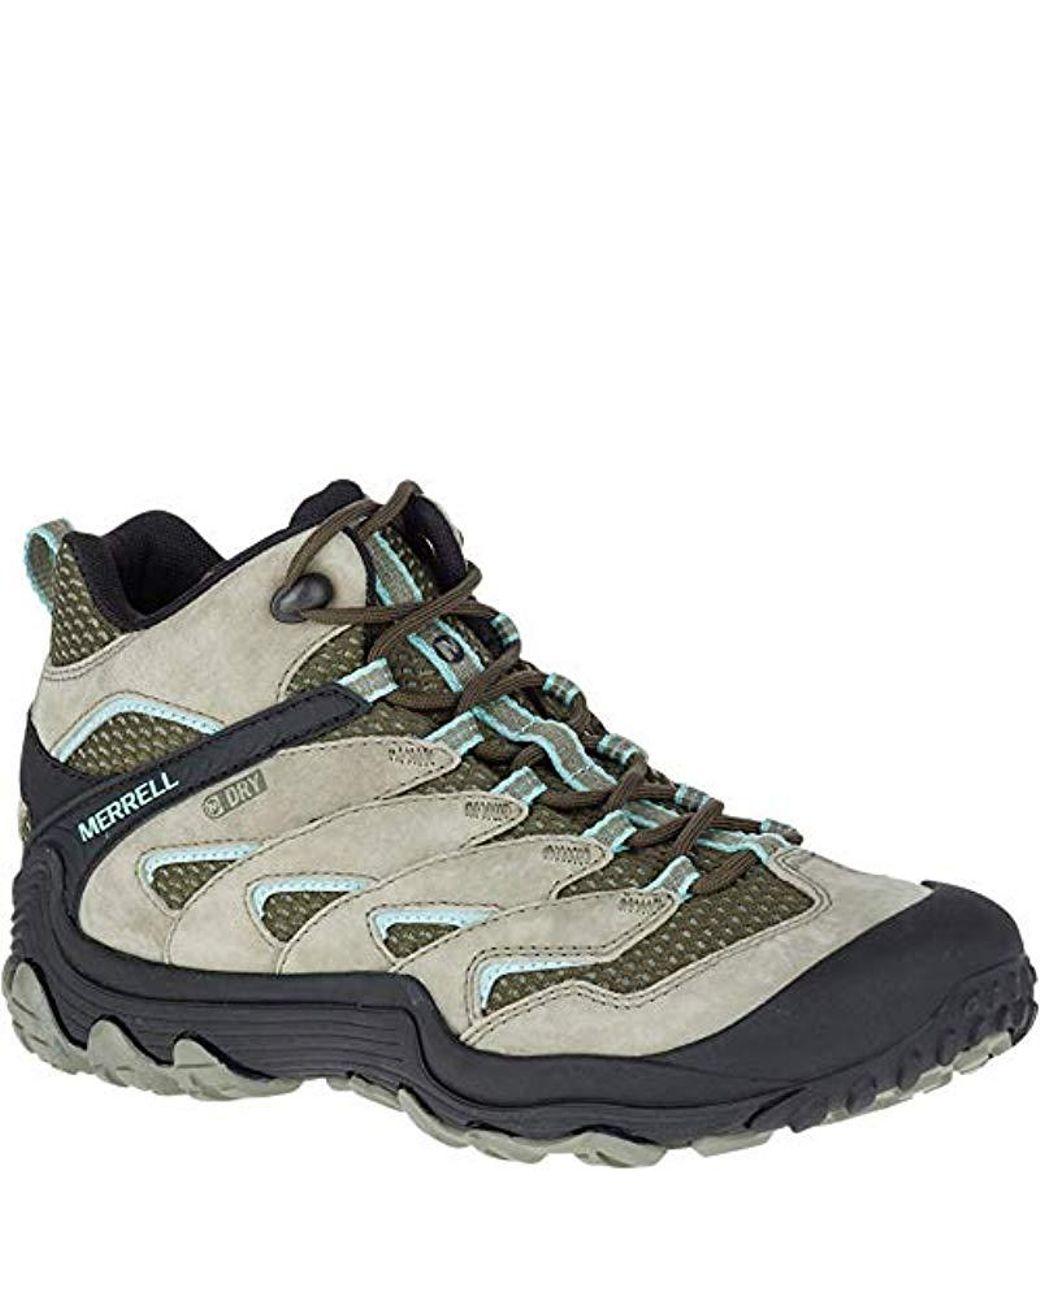 ec32282e3e3 Merrell Chameleon 7 Limit Mid Waterproof Hiking Boot in Green for Men - Lyst